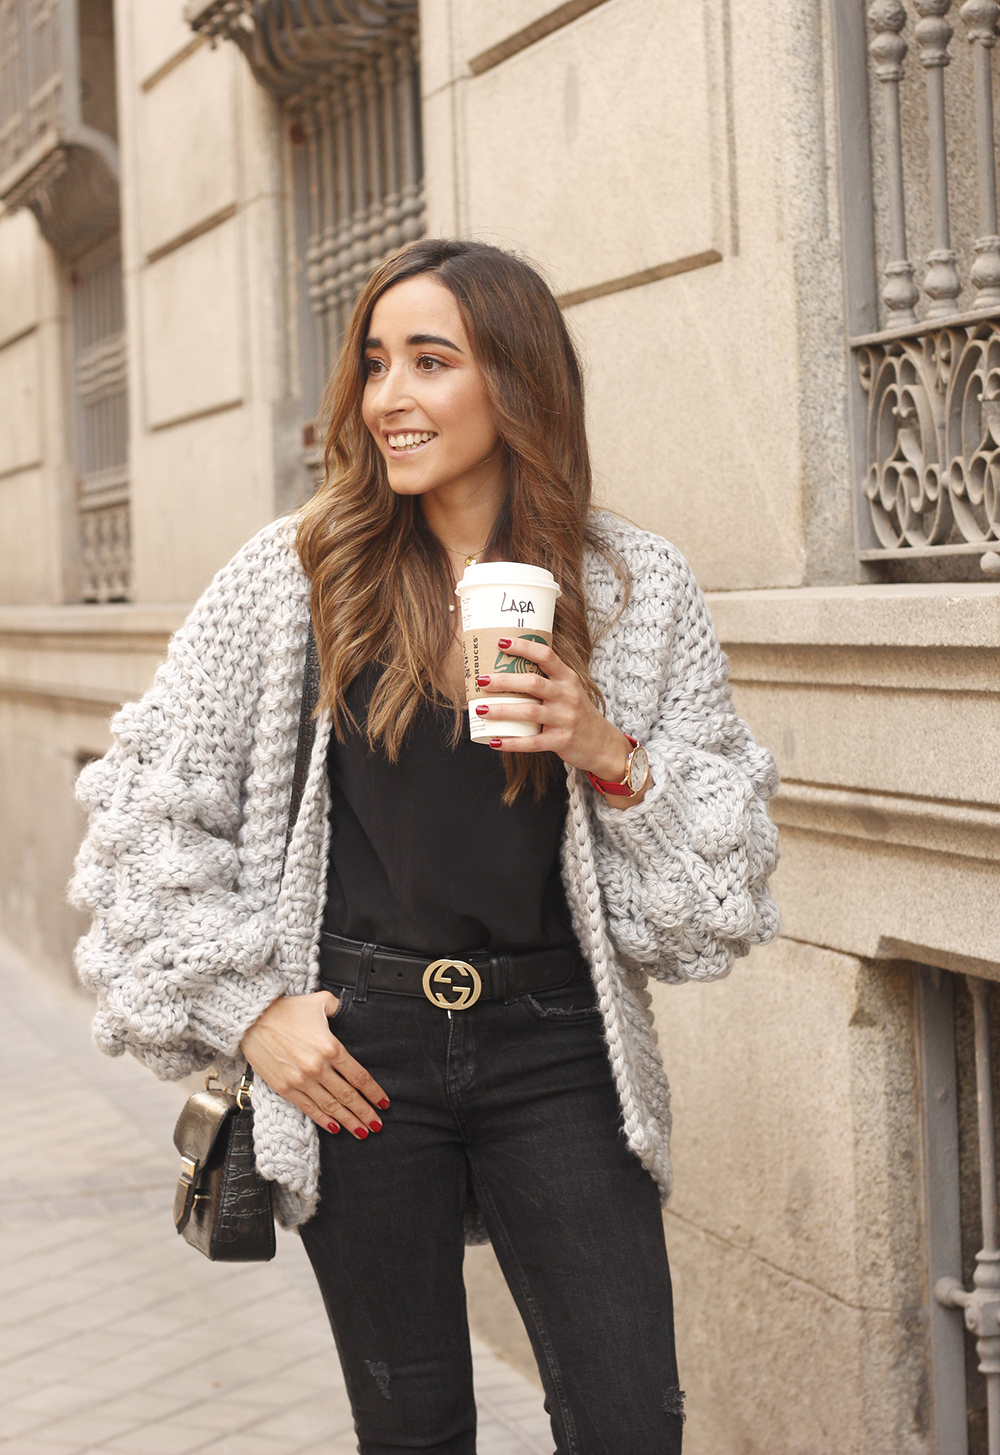 Grey cardigan black jeans folli folie watch leopard print heels starbucks tea street style fall outfit 201808